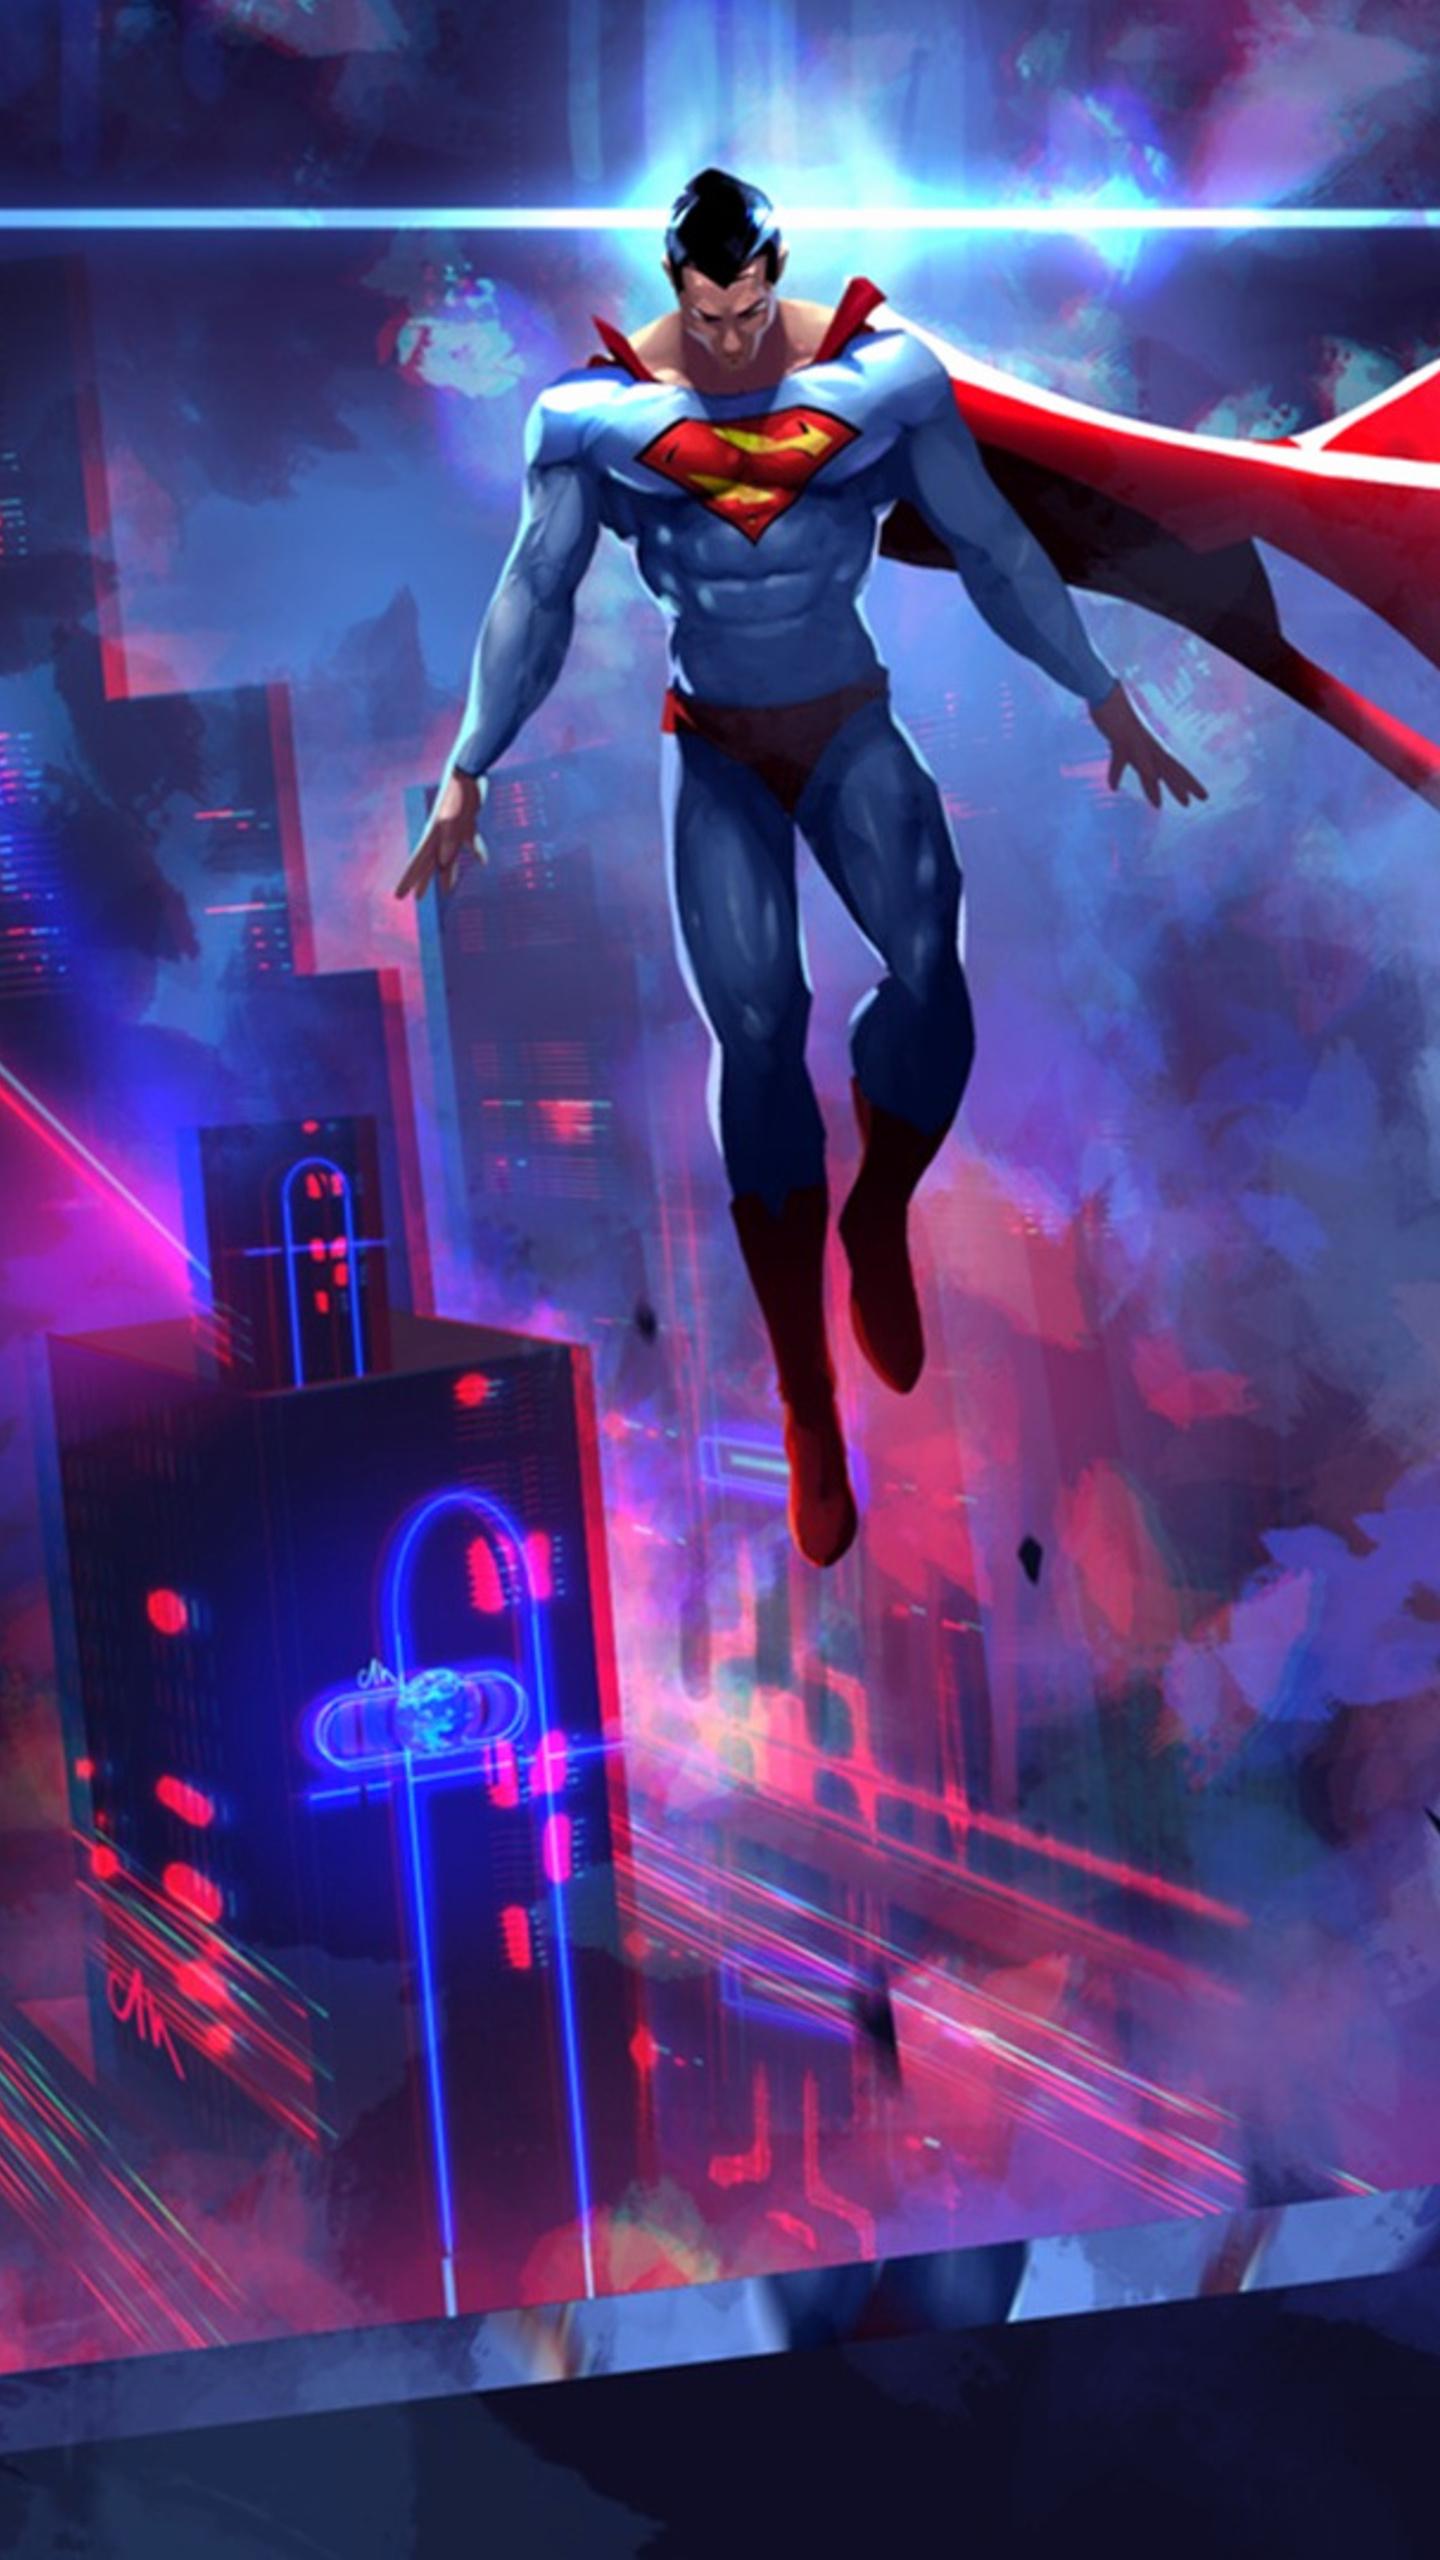 1440x2560 Batman Vs Superman Art Samsung Galaxy S6s7